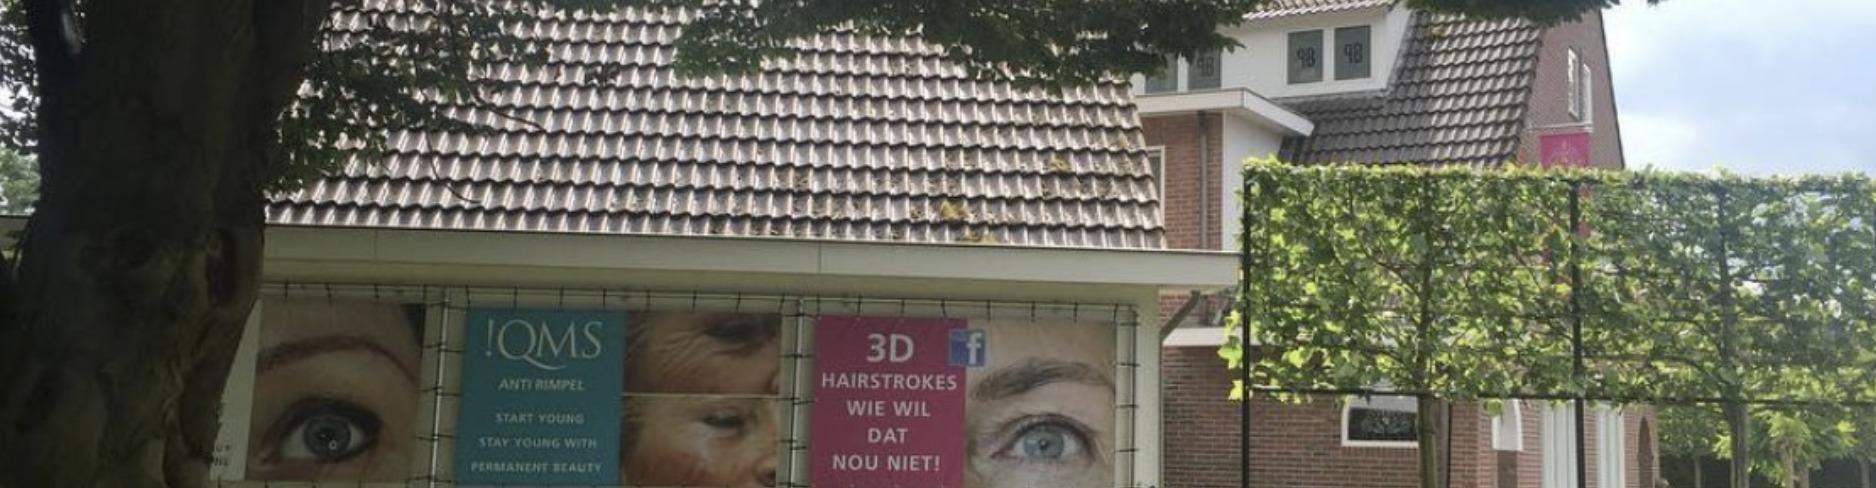 Huidinstituut Parkstad in Kerkrade